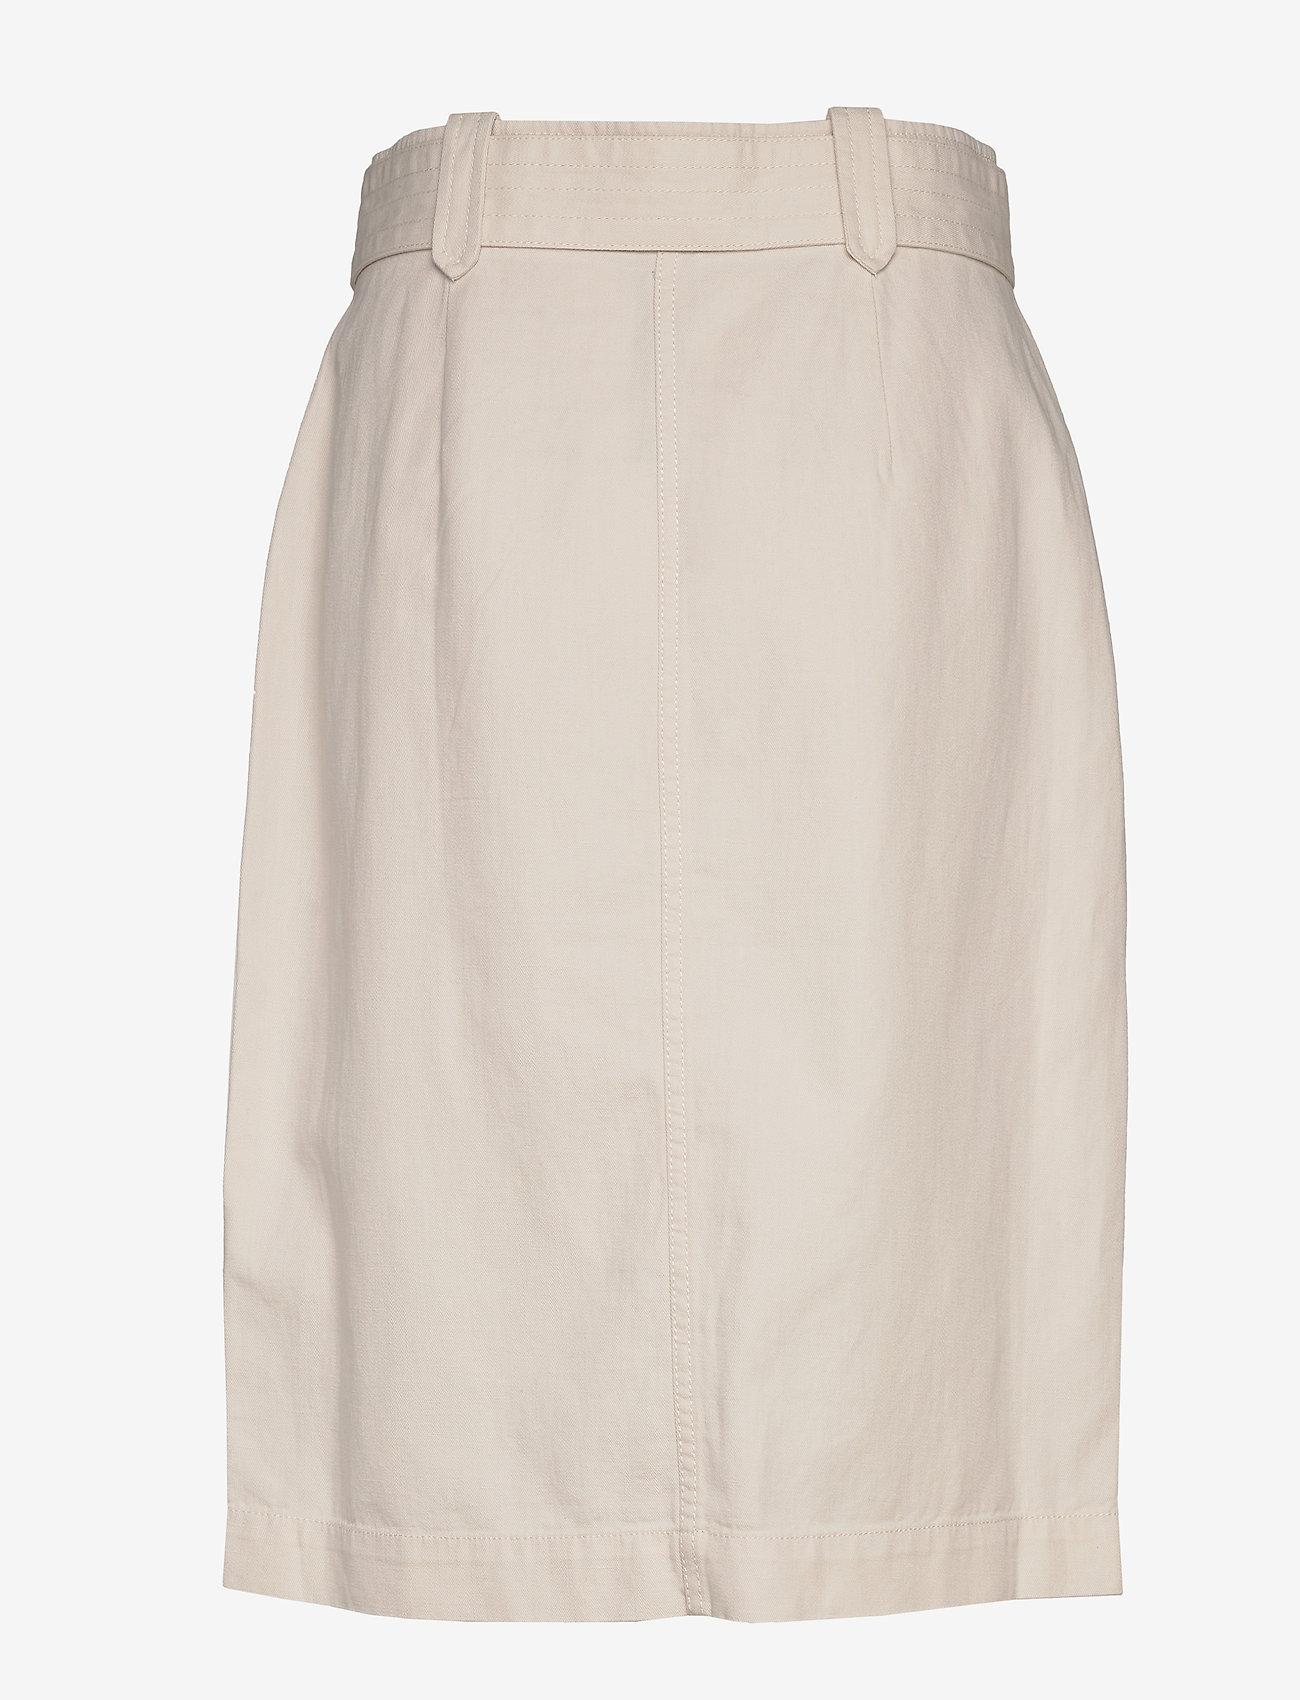 Banana Republic - Heritage Cotton-Linen Safari Skirt - midi skirts - transition cream - 1